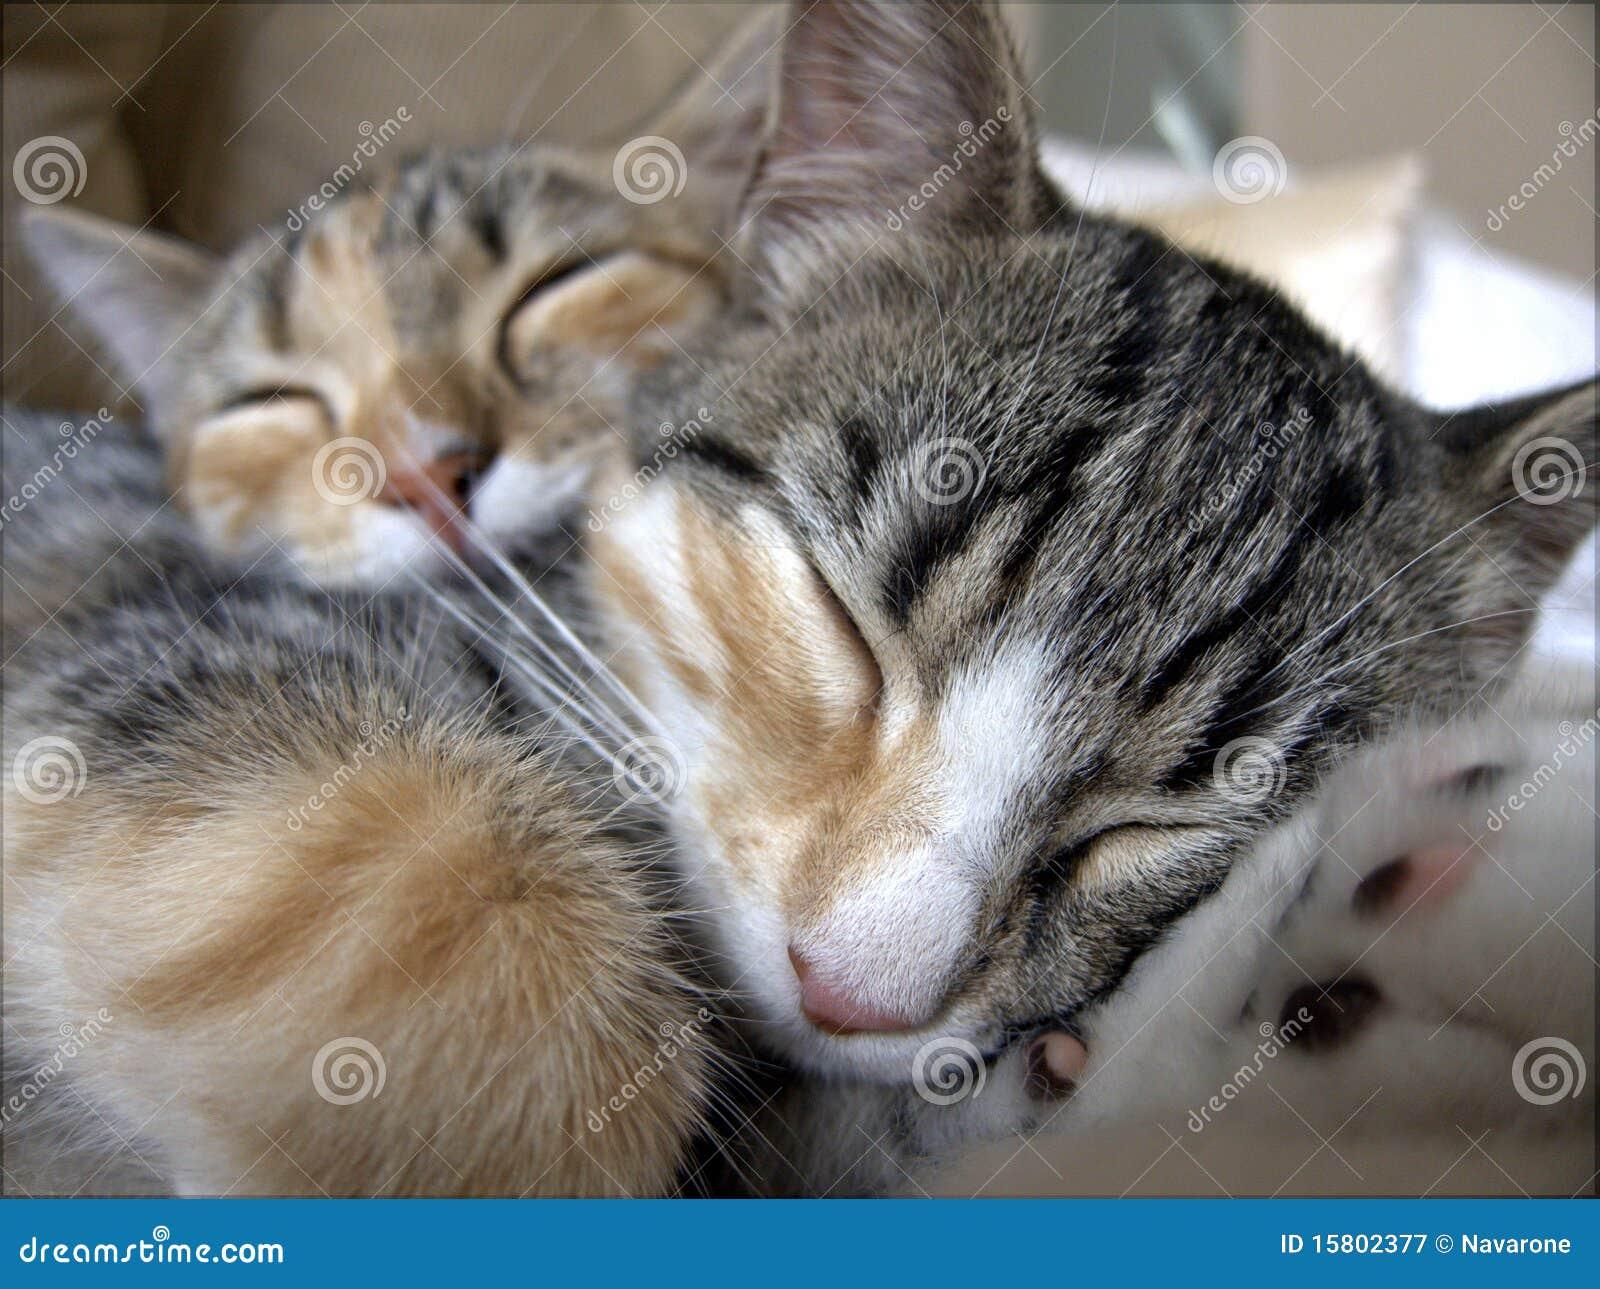 Sleeping Tabby Cats Royalty Free Stock Photography Image